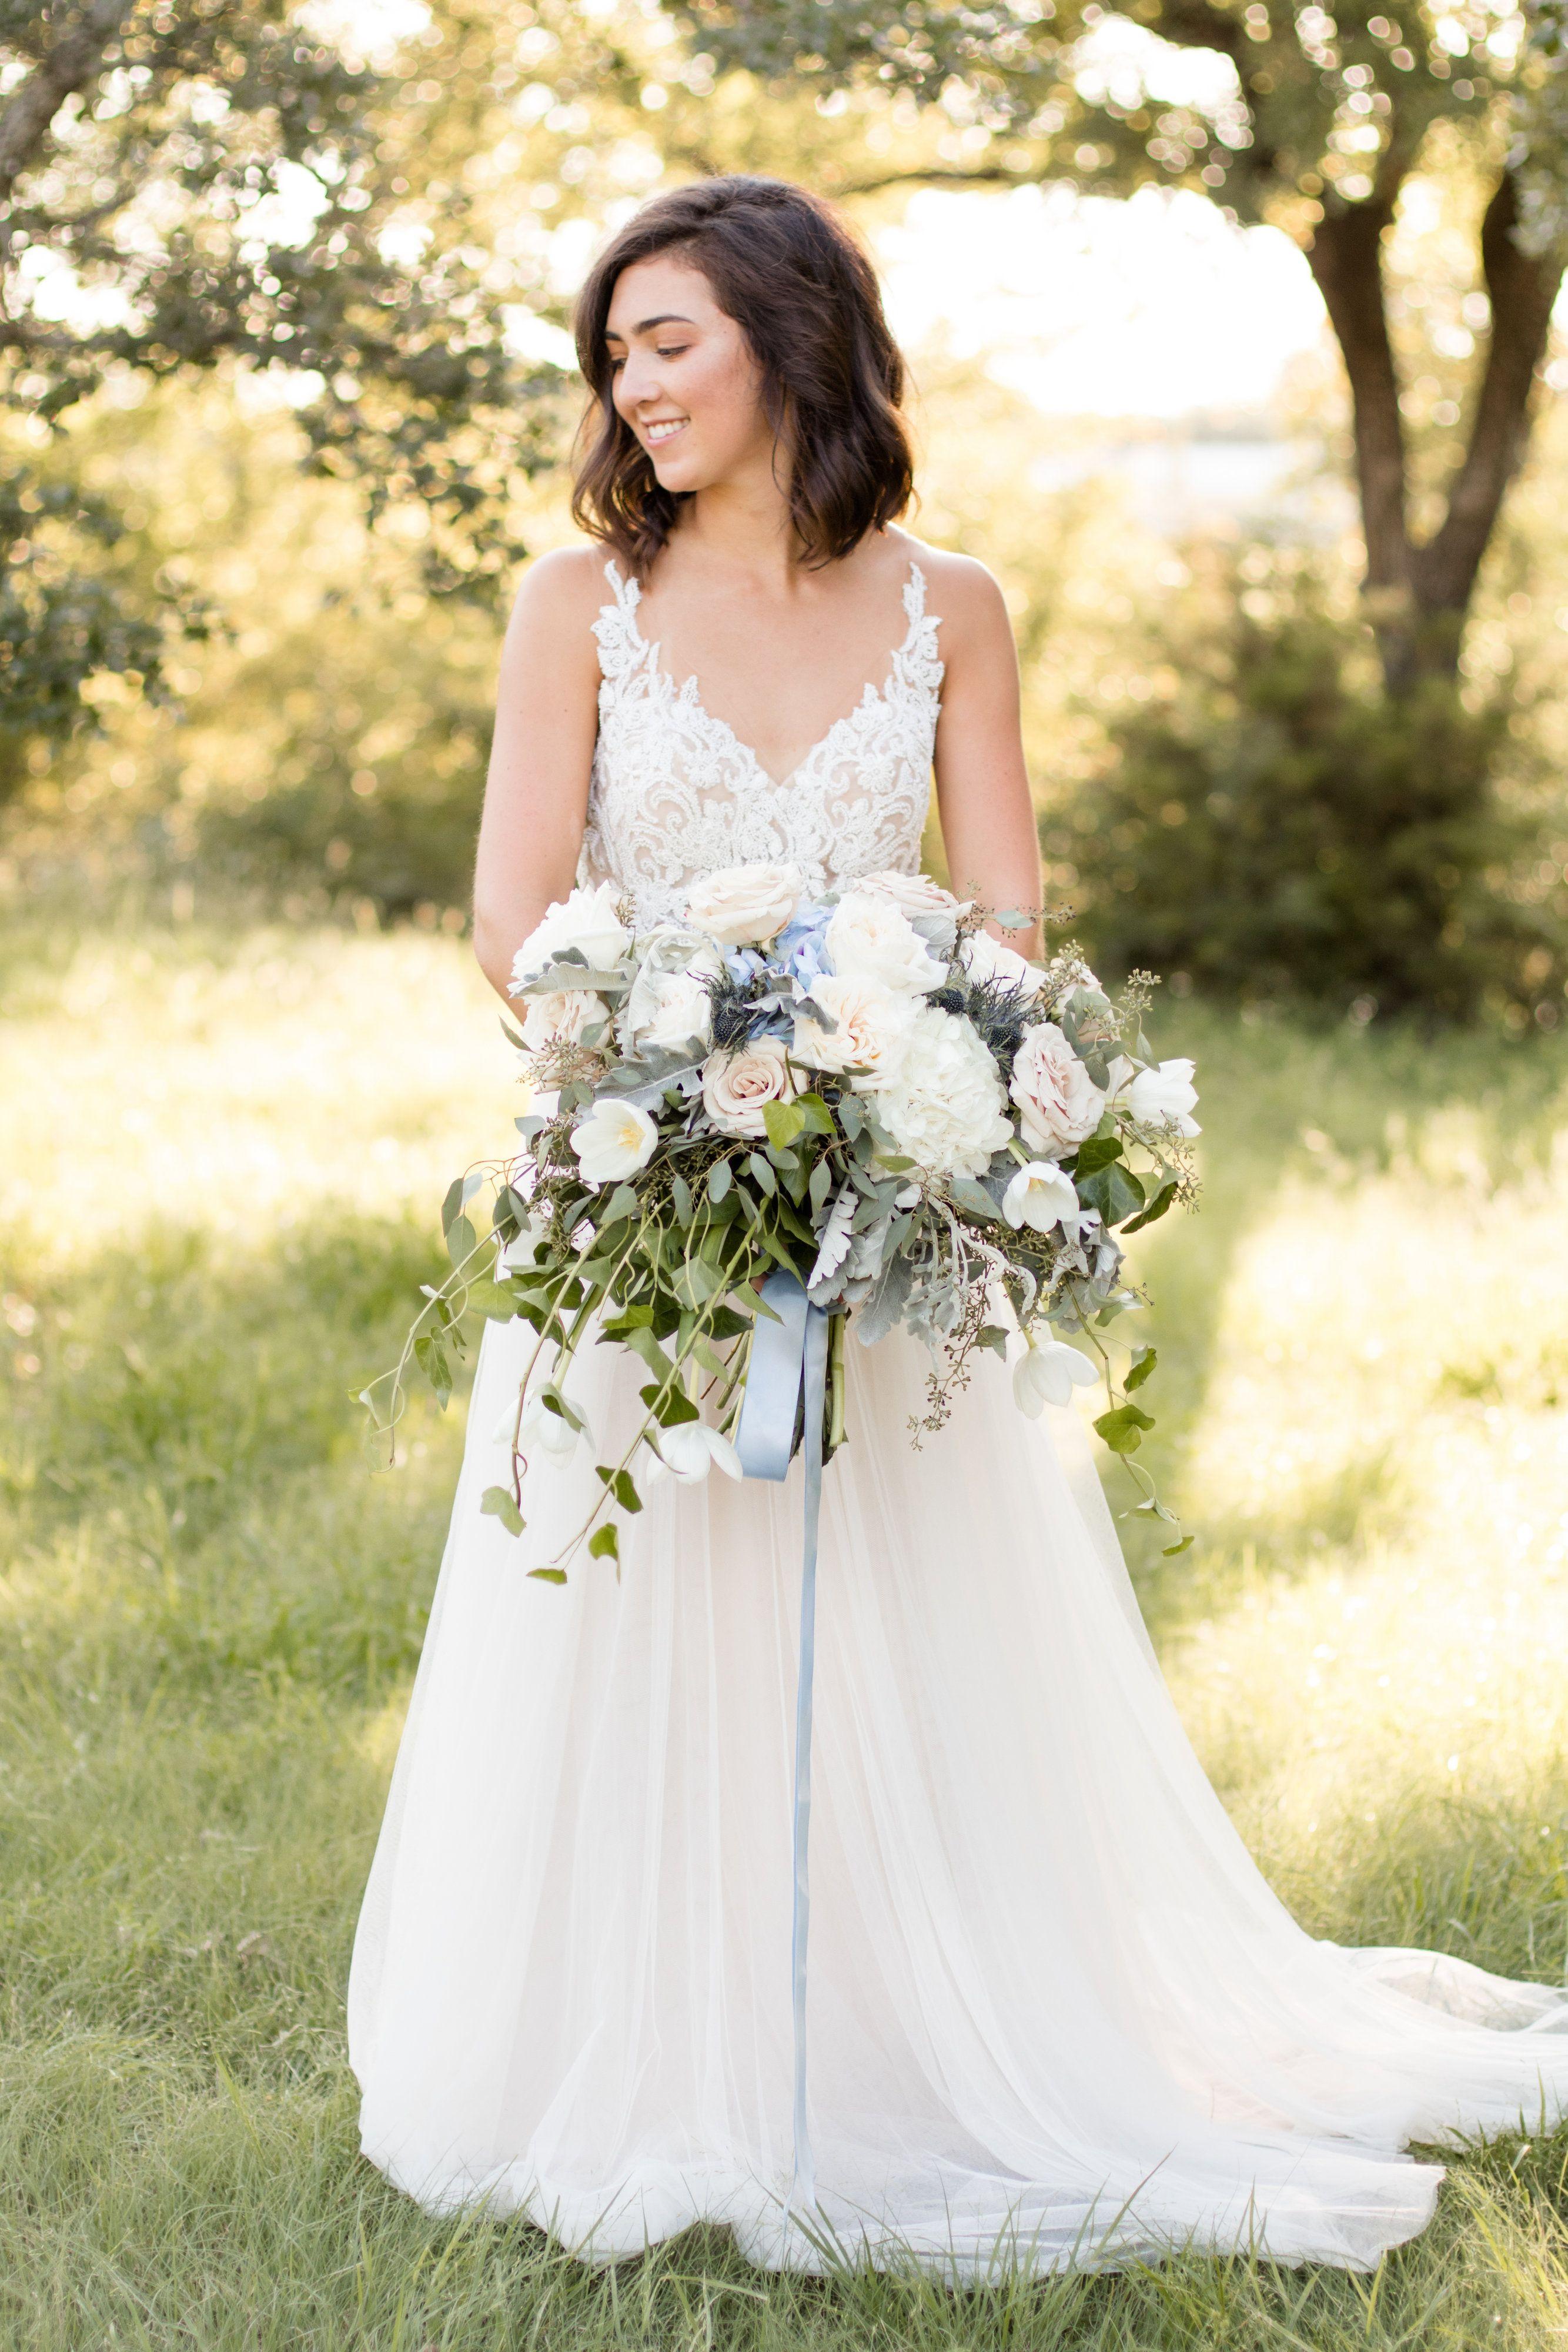 Bridal Portraits Lace Dress Wedding Dress Lush Oversized Garden